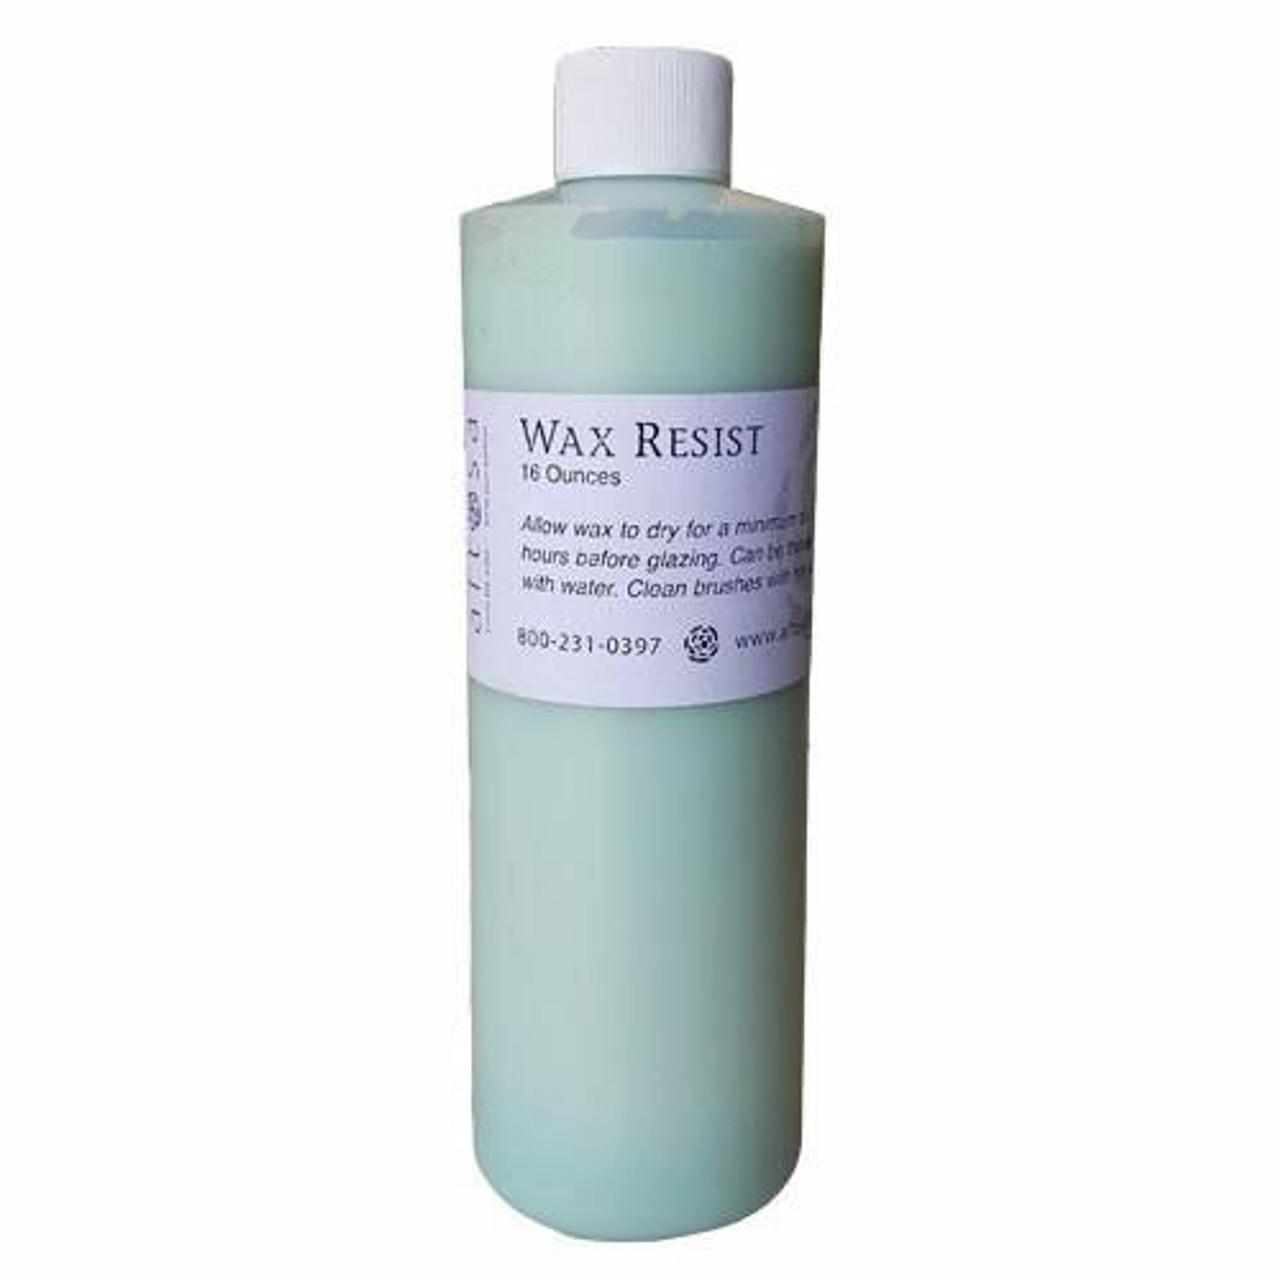 16 ounce (1 pint) wax resist from AFTOSA